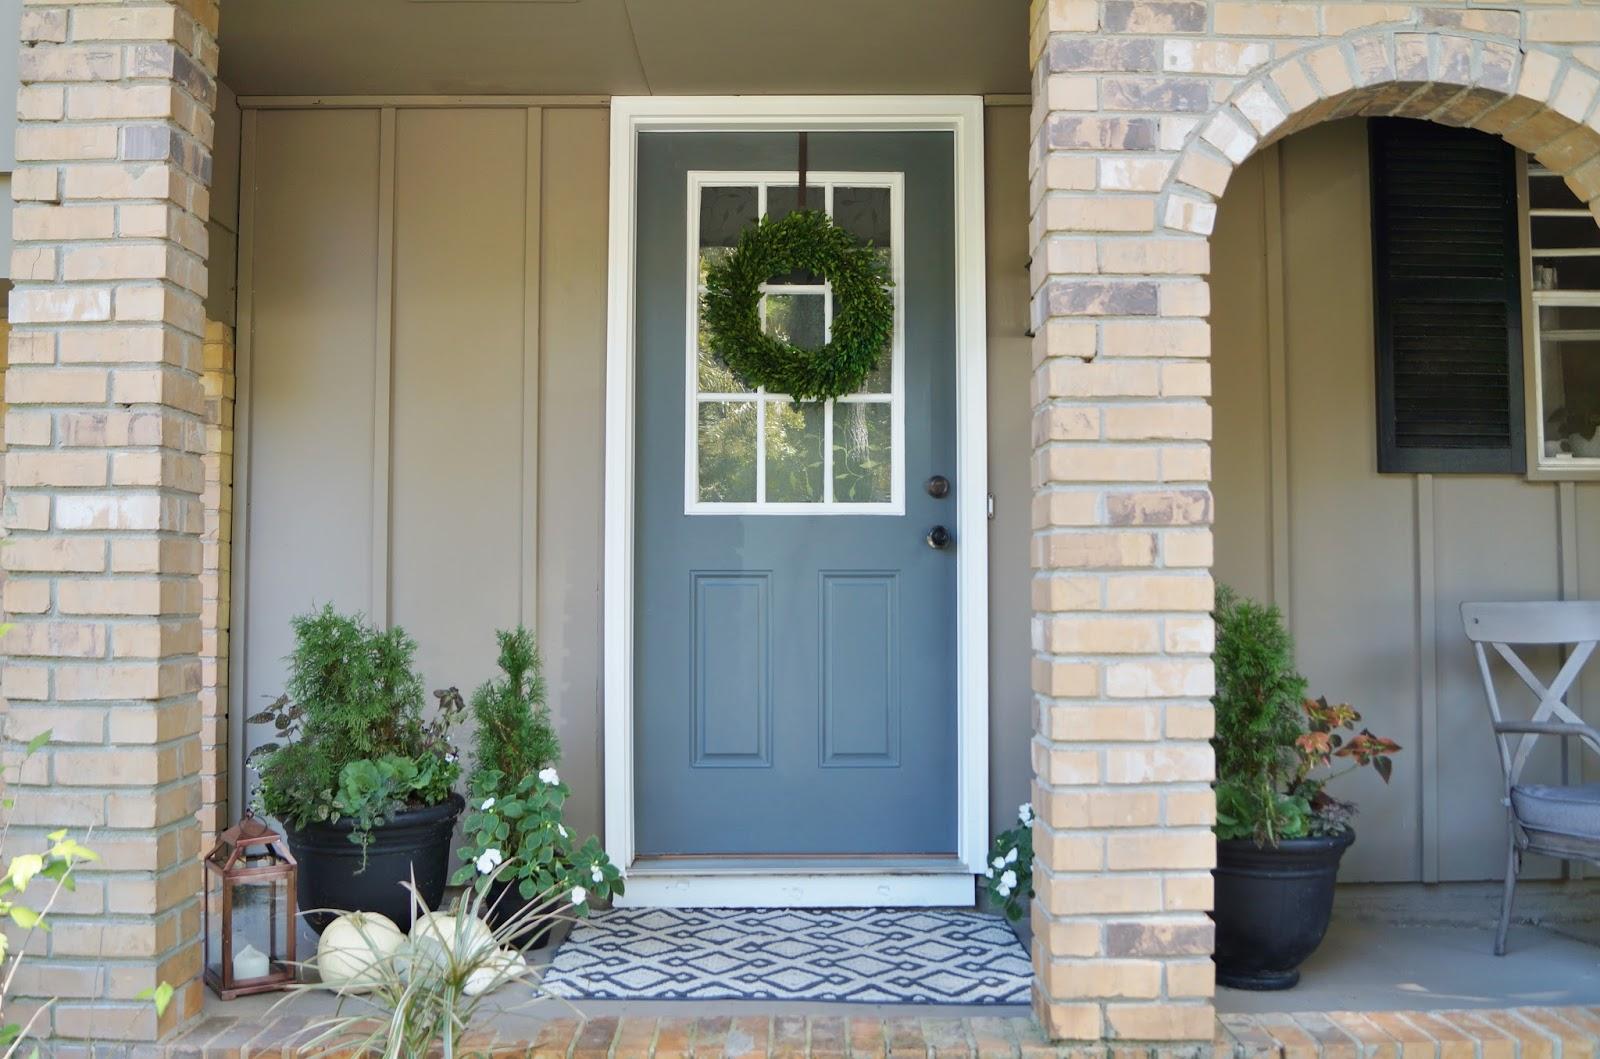 Exterior Door Colors: Don't Disturb This Groove: A New Front Door Color